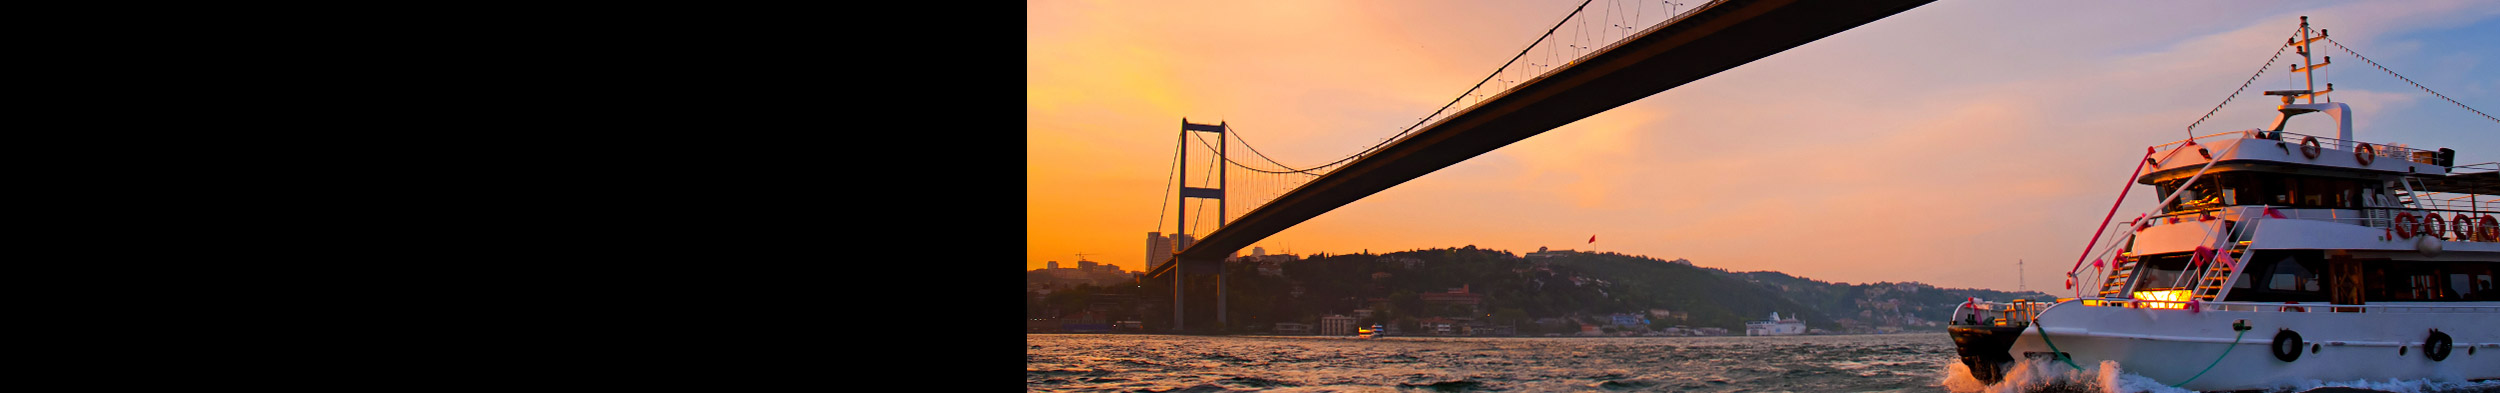 Istanbul-Nun-Overland